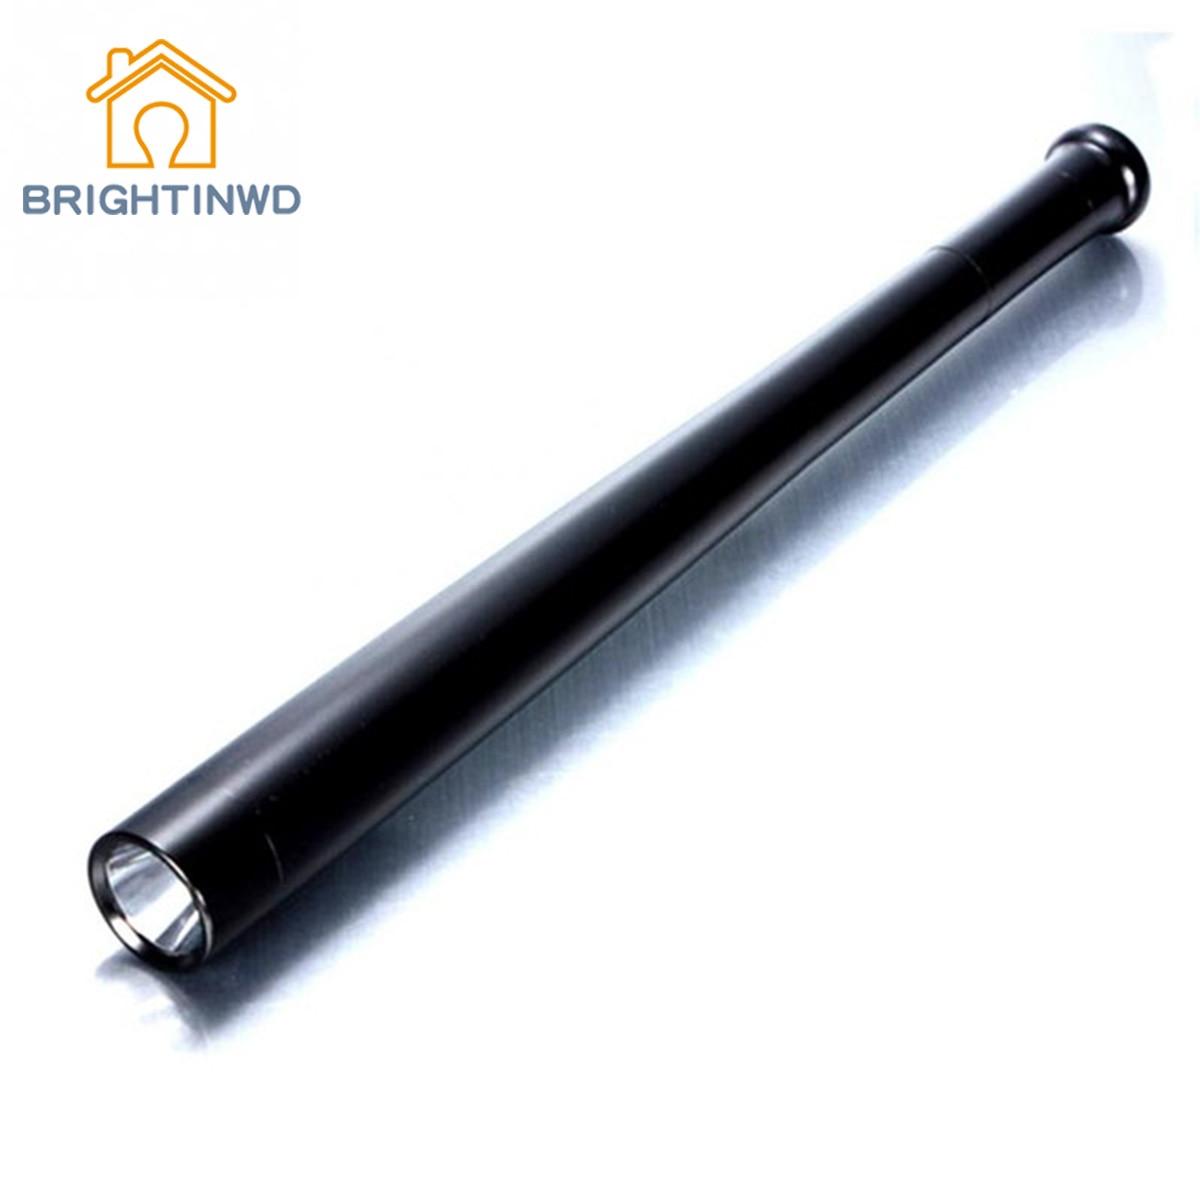 BRIGHTINWD Saft Lighting Lamp 3 Mode Baseball Stick Flashlight Security Camping Light Torch цена